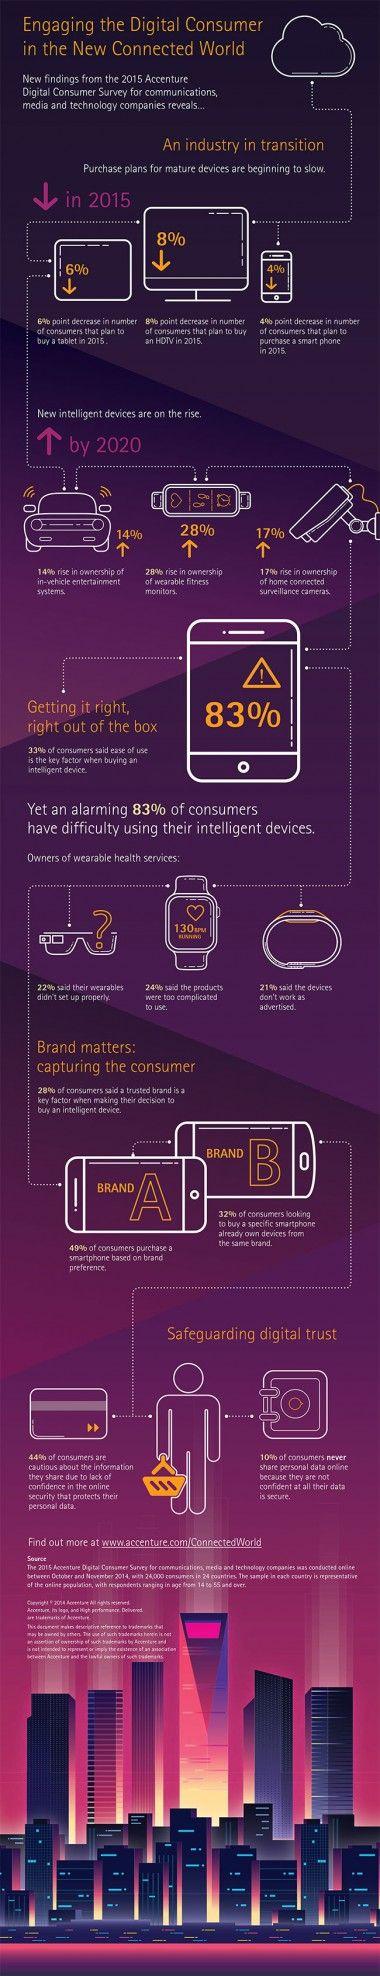 Accenture-Connecting-Digital-Consumer-Infographic